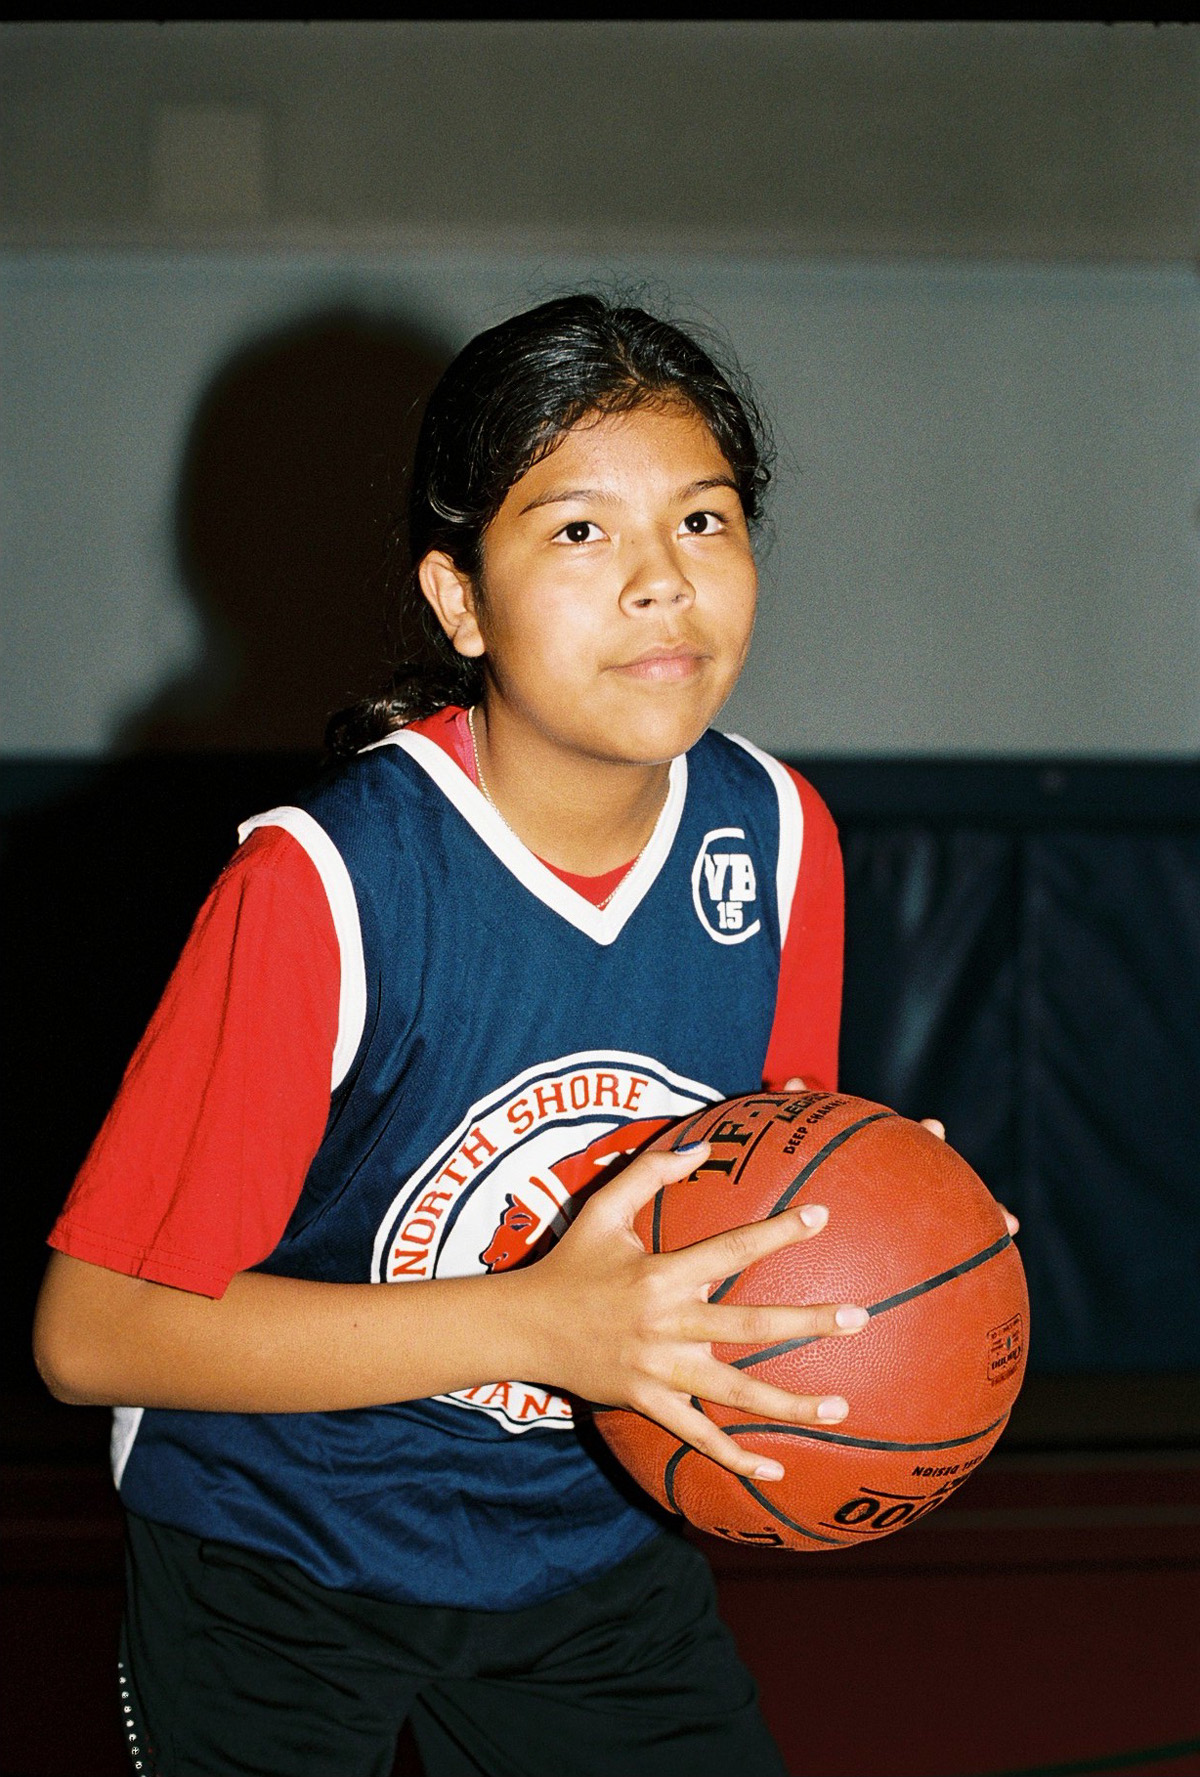 """Sḵwx̱wú7mesh Nation Basketball"" by Alana Paterson"